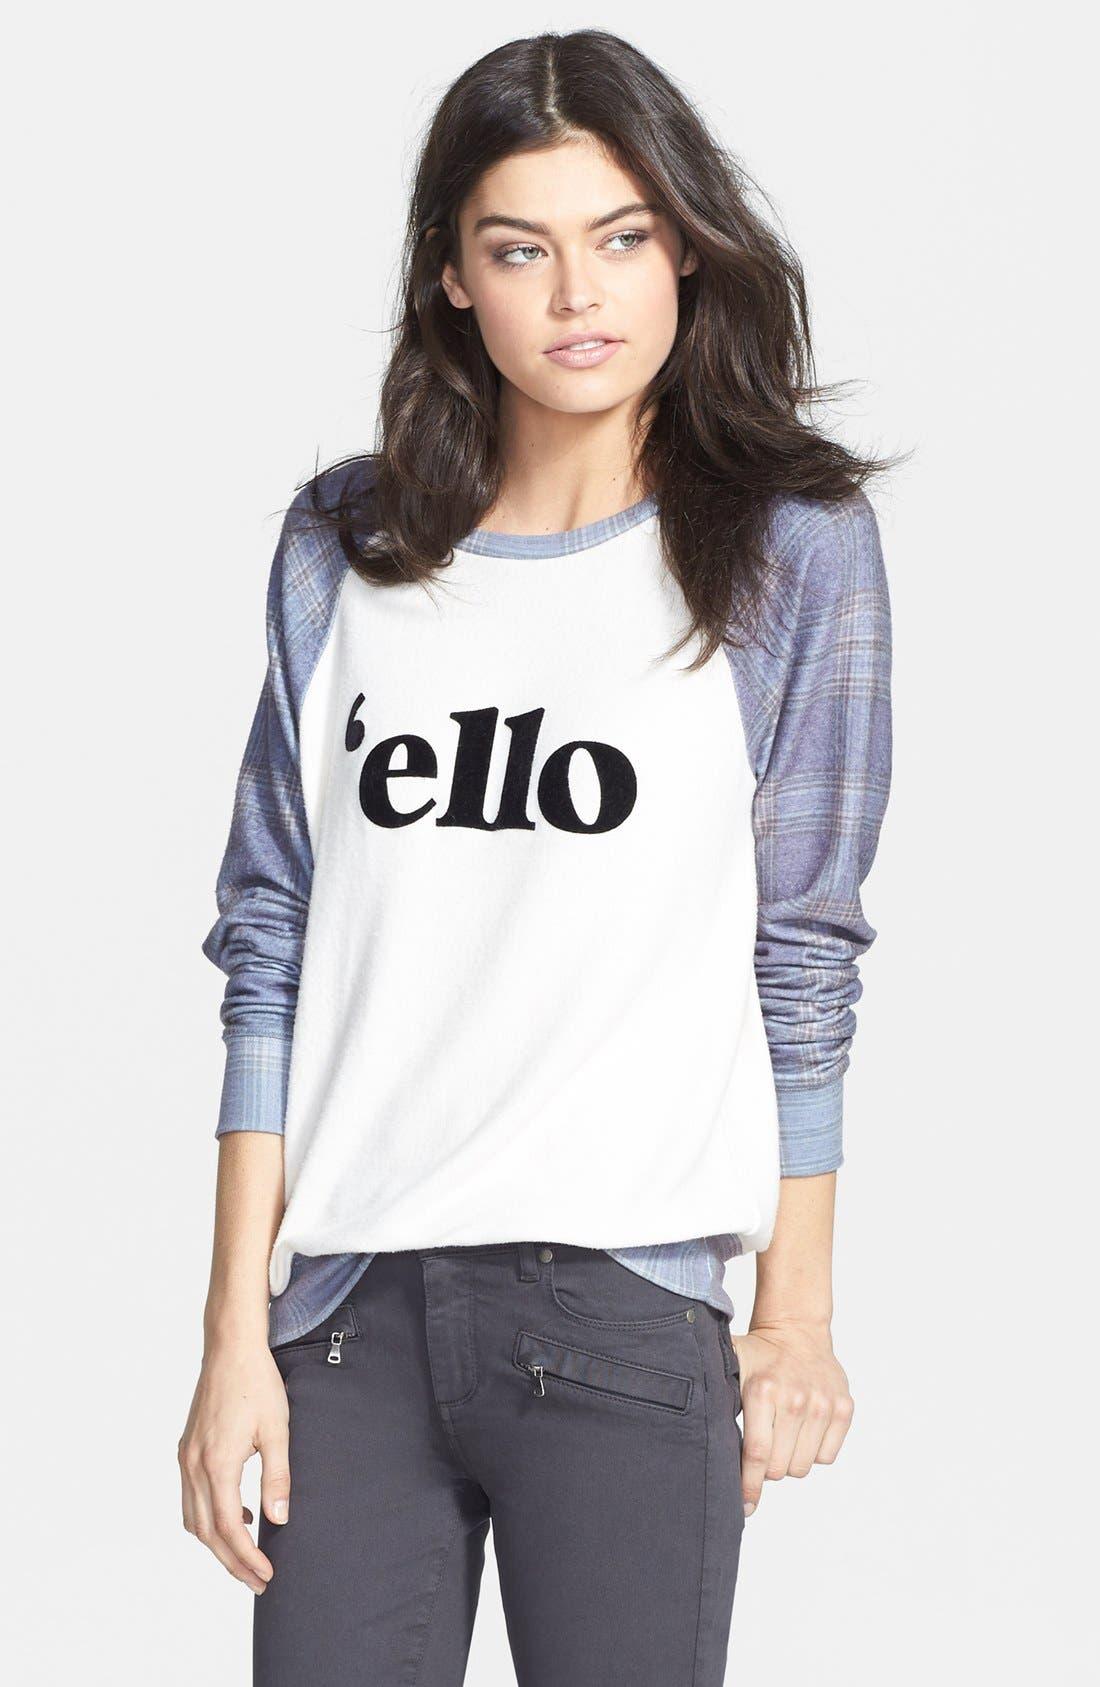 Alternate Image 1 Selected - Wildfox 'Ello' Raglan Pullover (Nordstrom Exclusive)